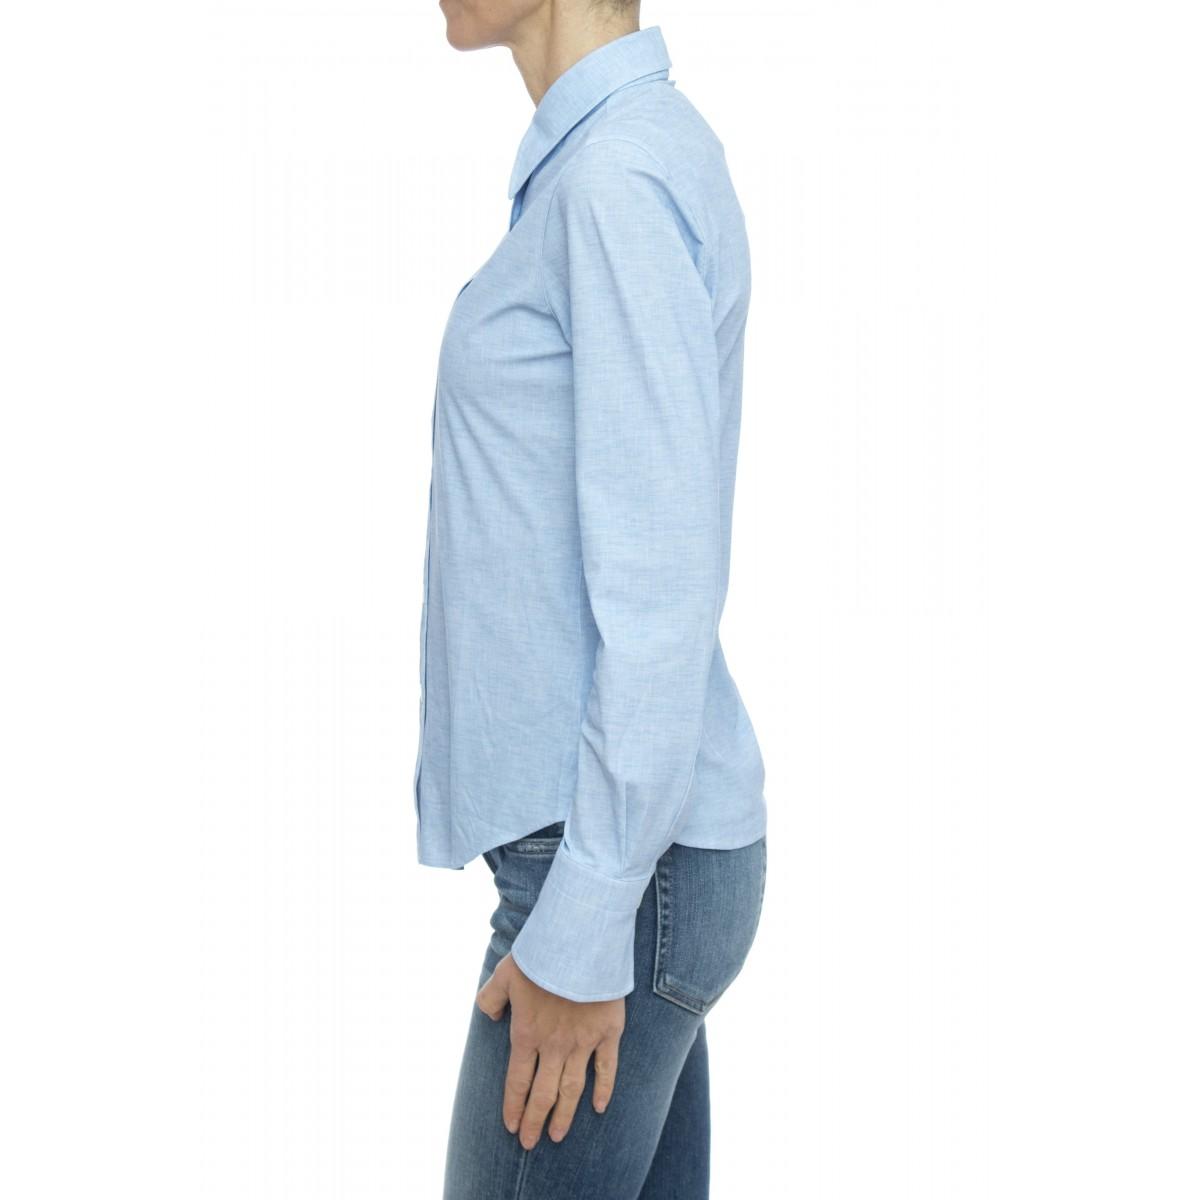 Camicia donna - 8as z9p skin like no stiro